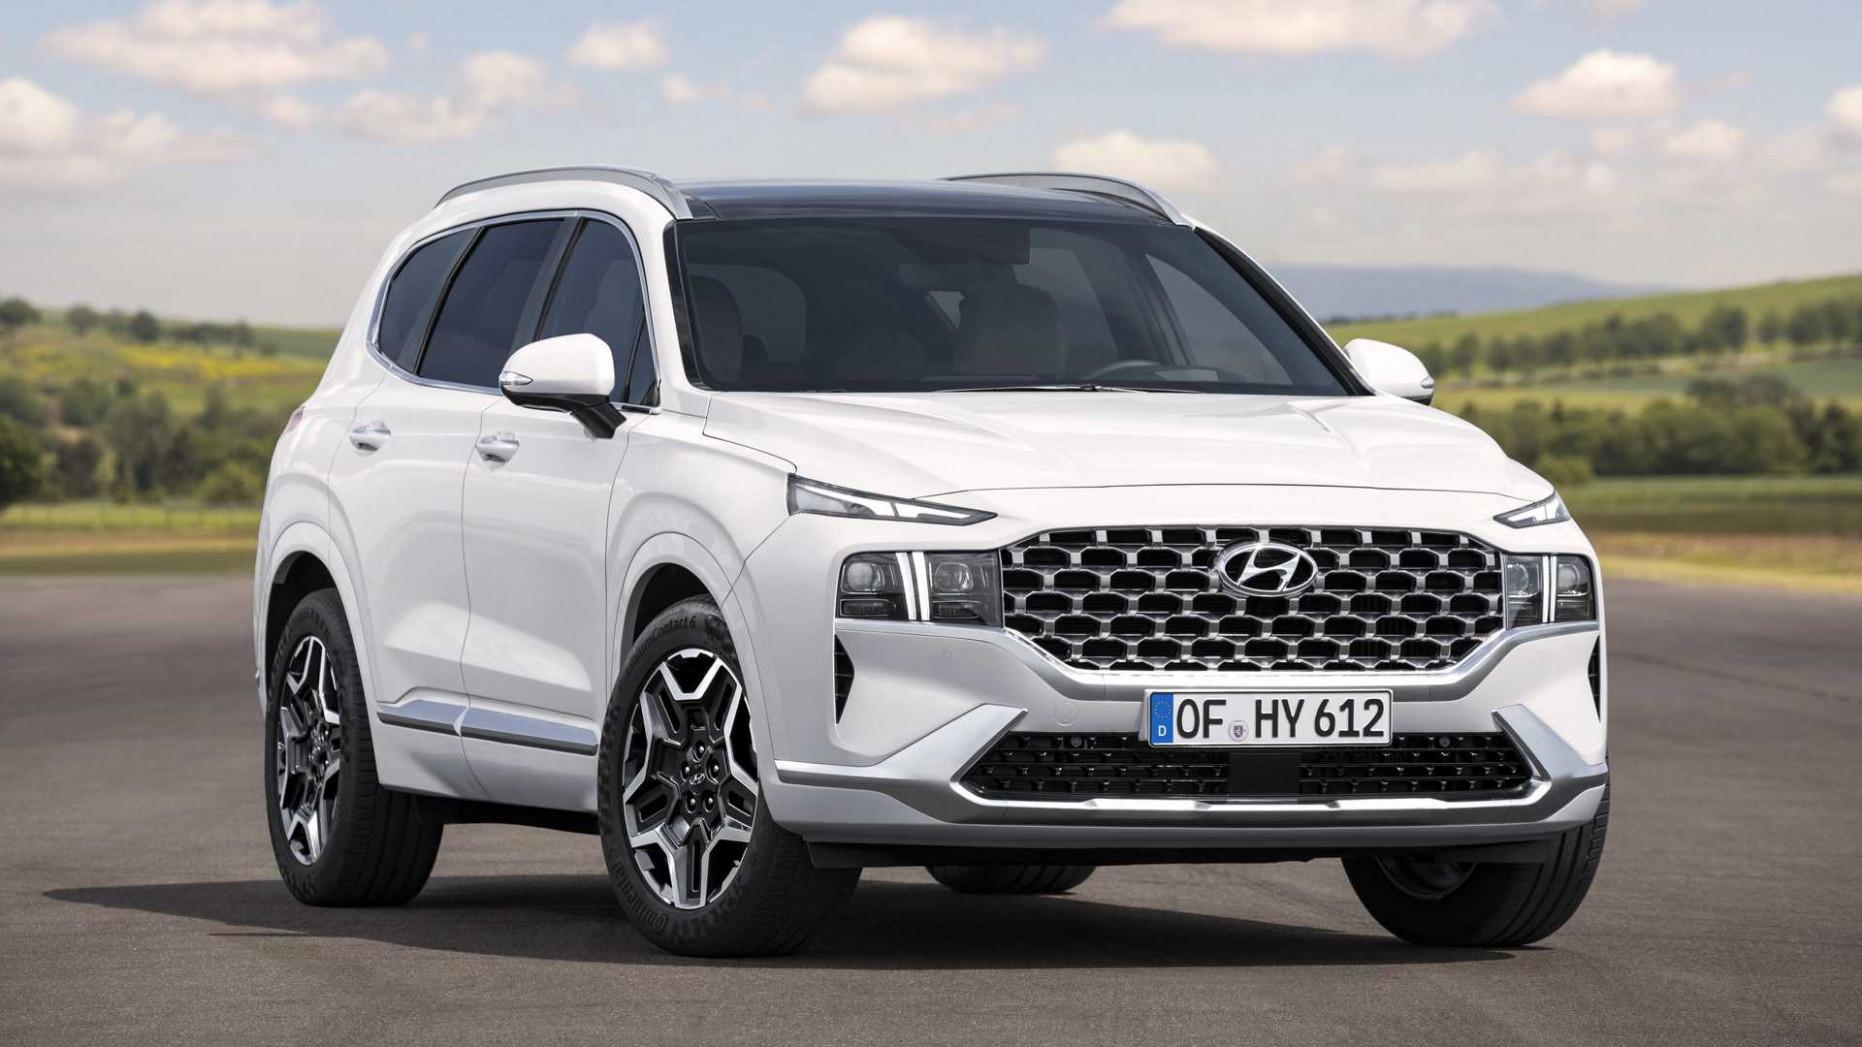 New Concept 2022 Hyundai Santa Fe